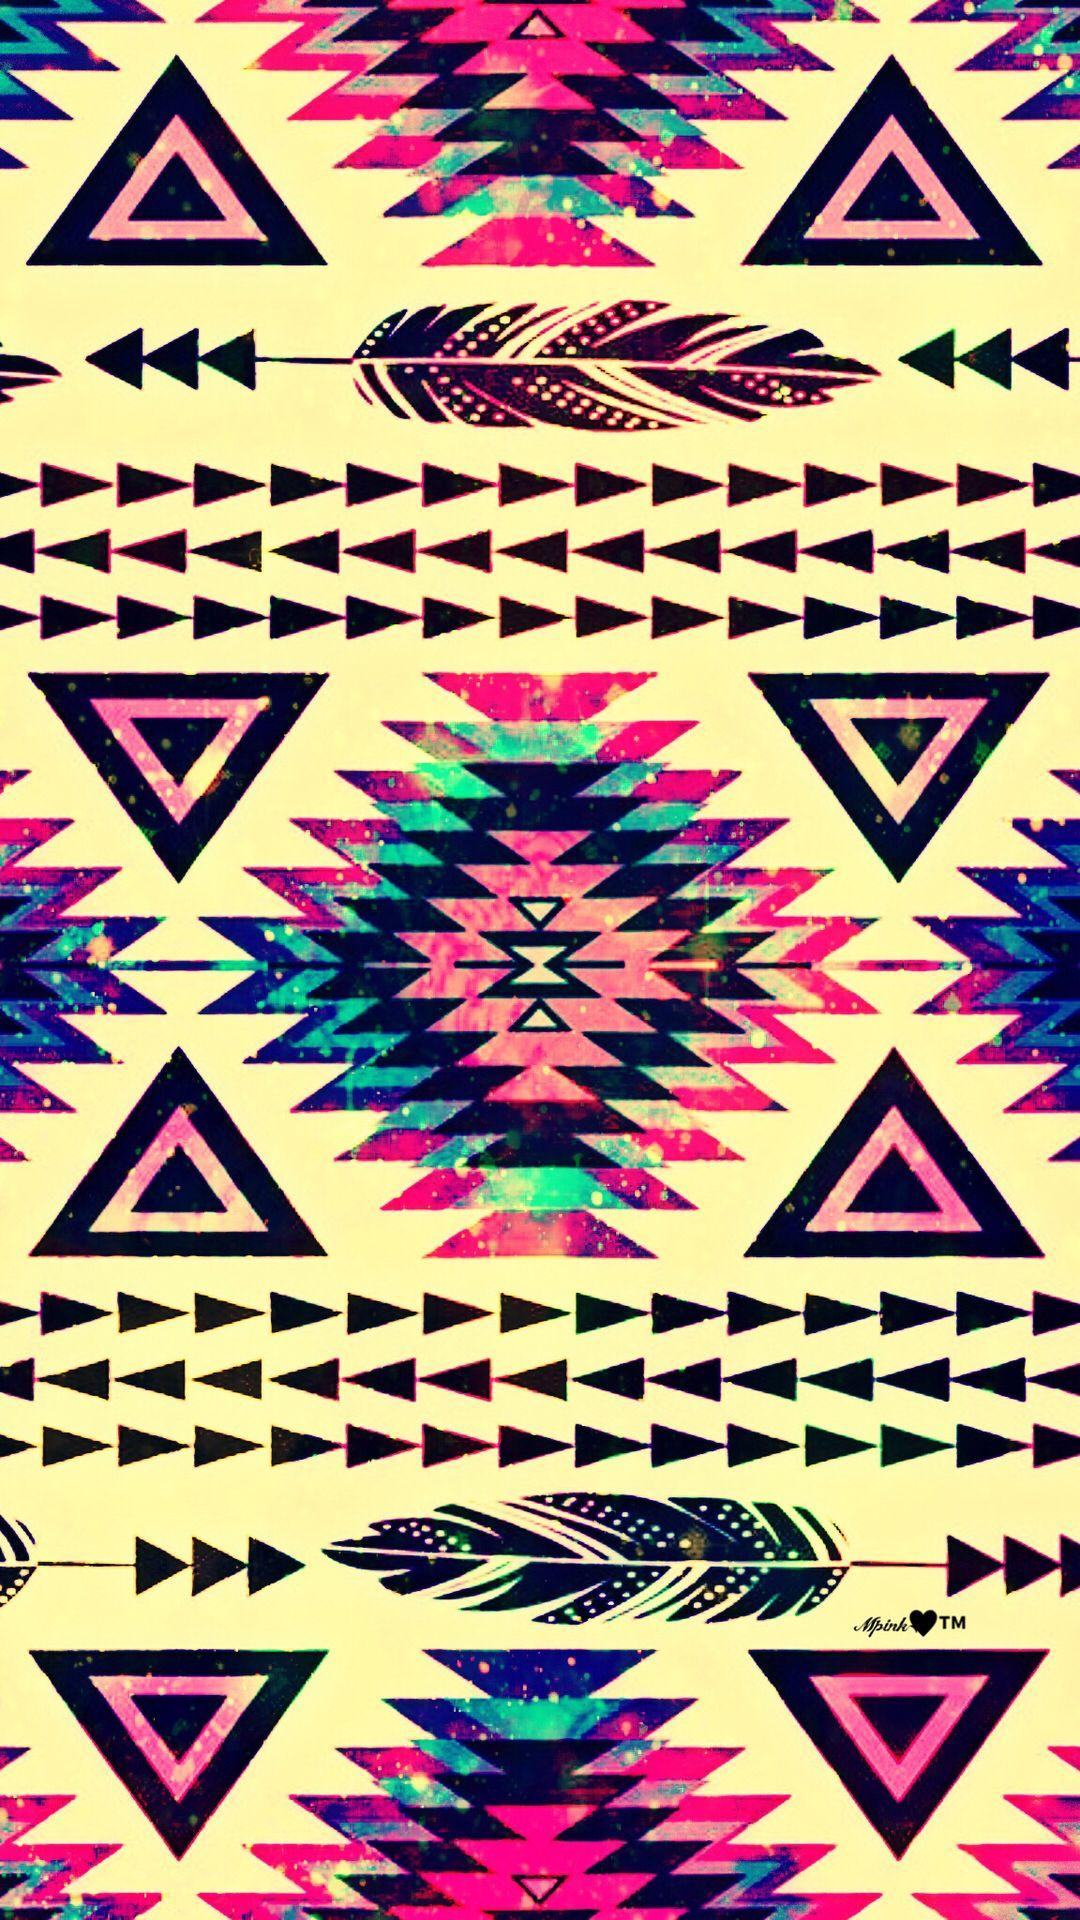 Boho Blanket Galaxy Wallpaper androidwallpaper iphonewallpaper 1080x1920